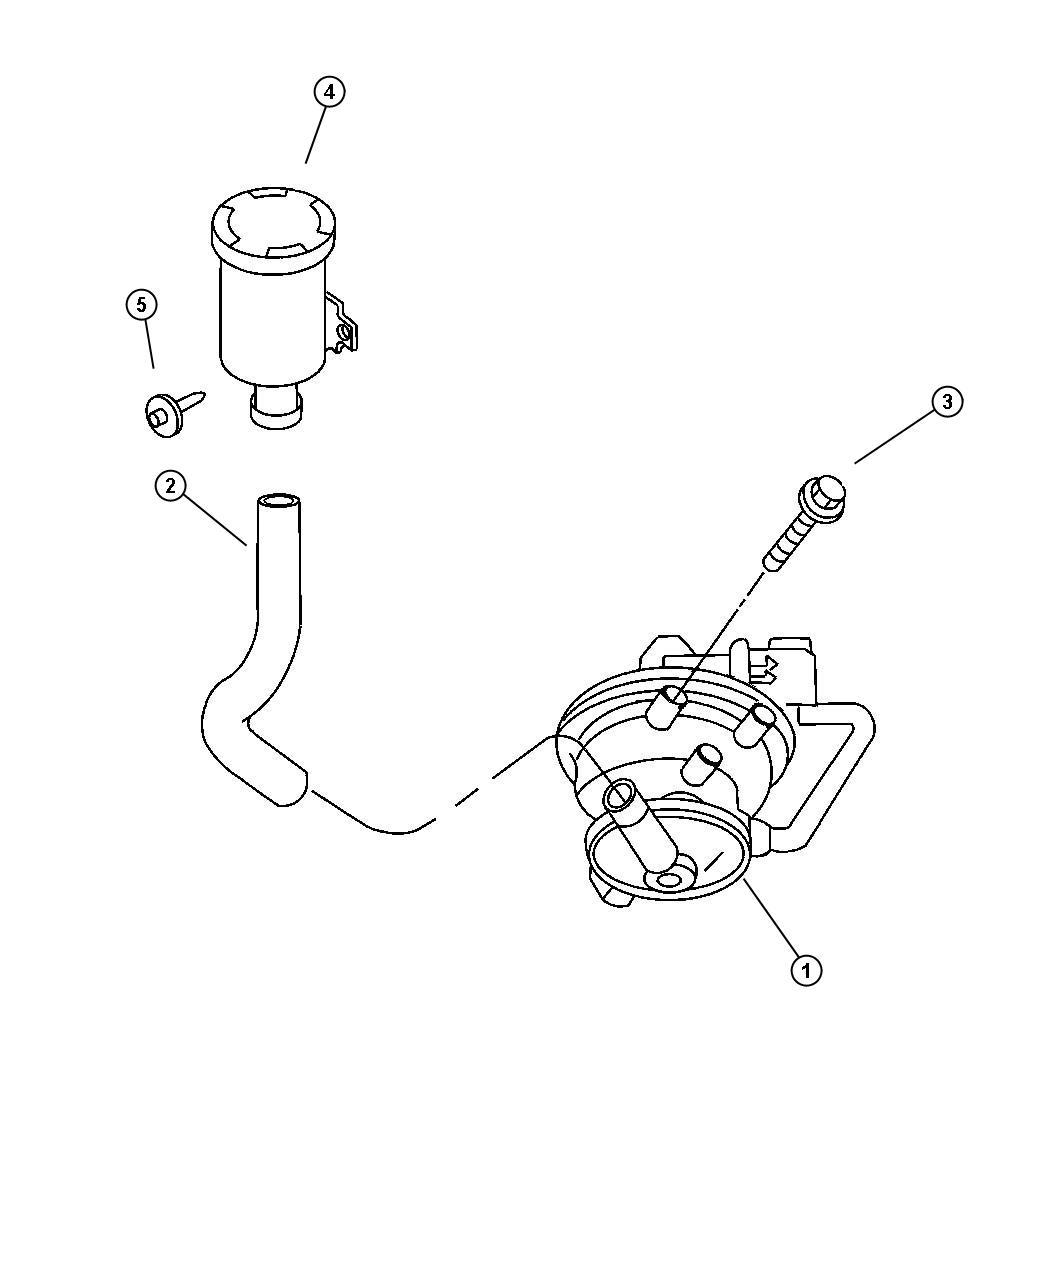 Dodge Durango Hose Leak Detection Pump Pump To Air